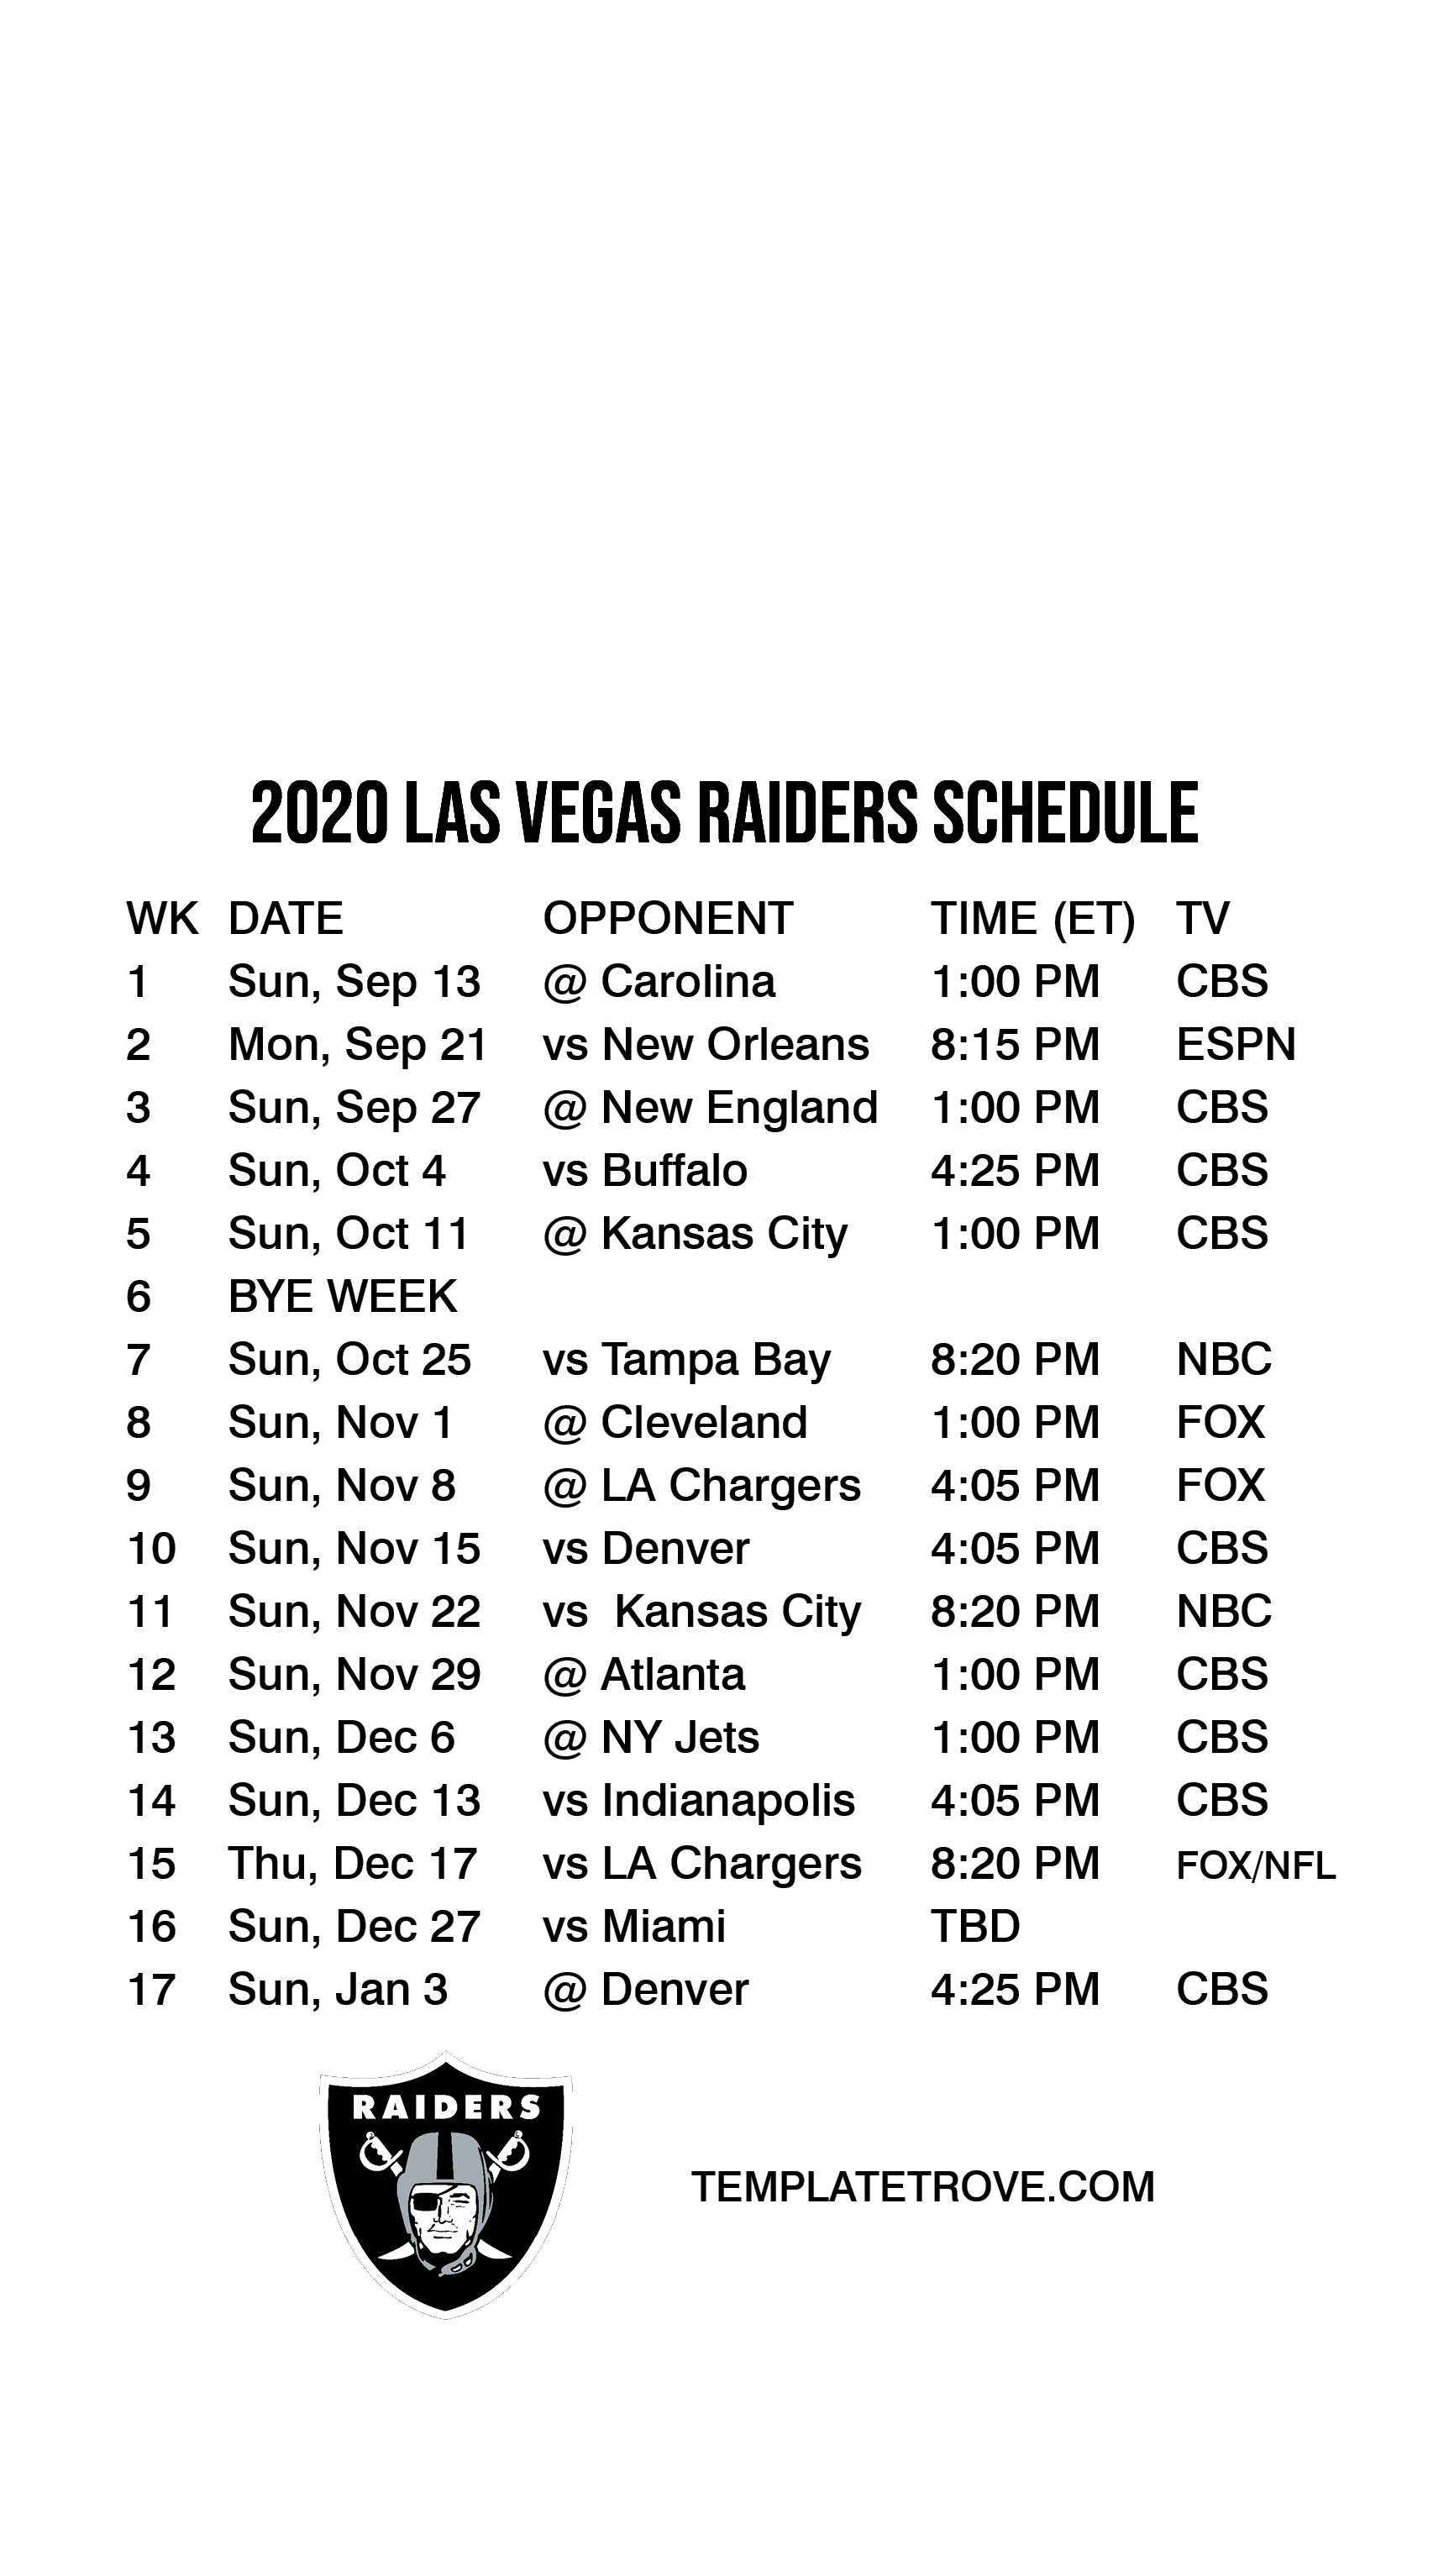 2020 2021 Las Vegas Raiders Lock Screen Schedule For Iphone 6 7 8 Plus